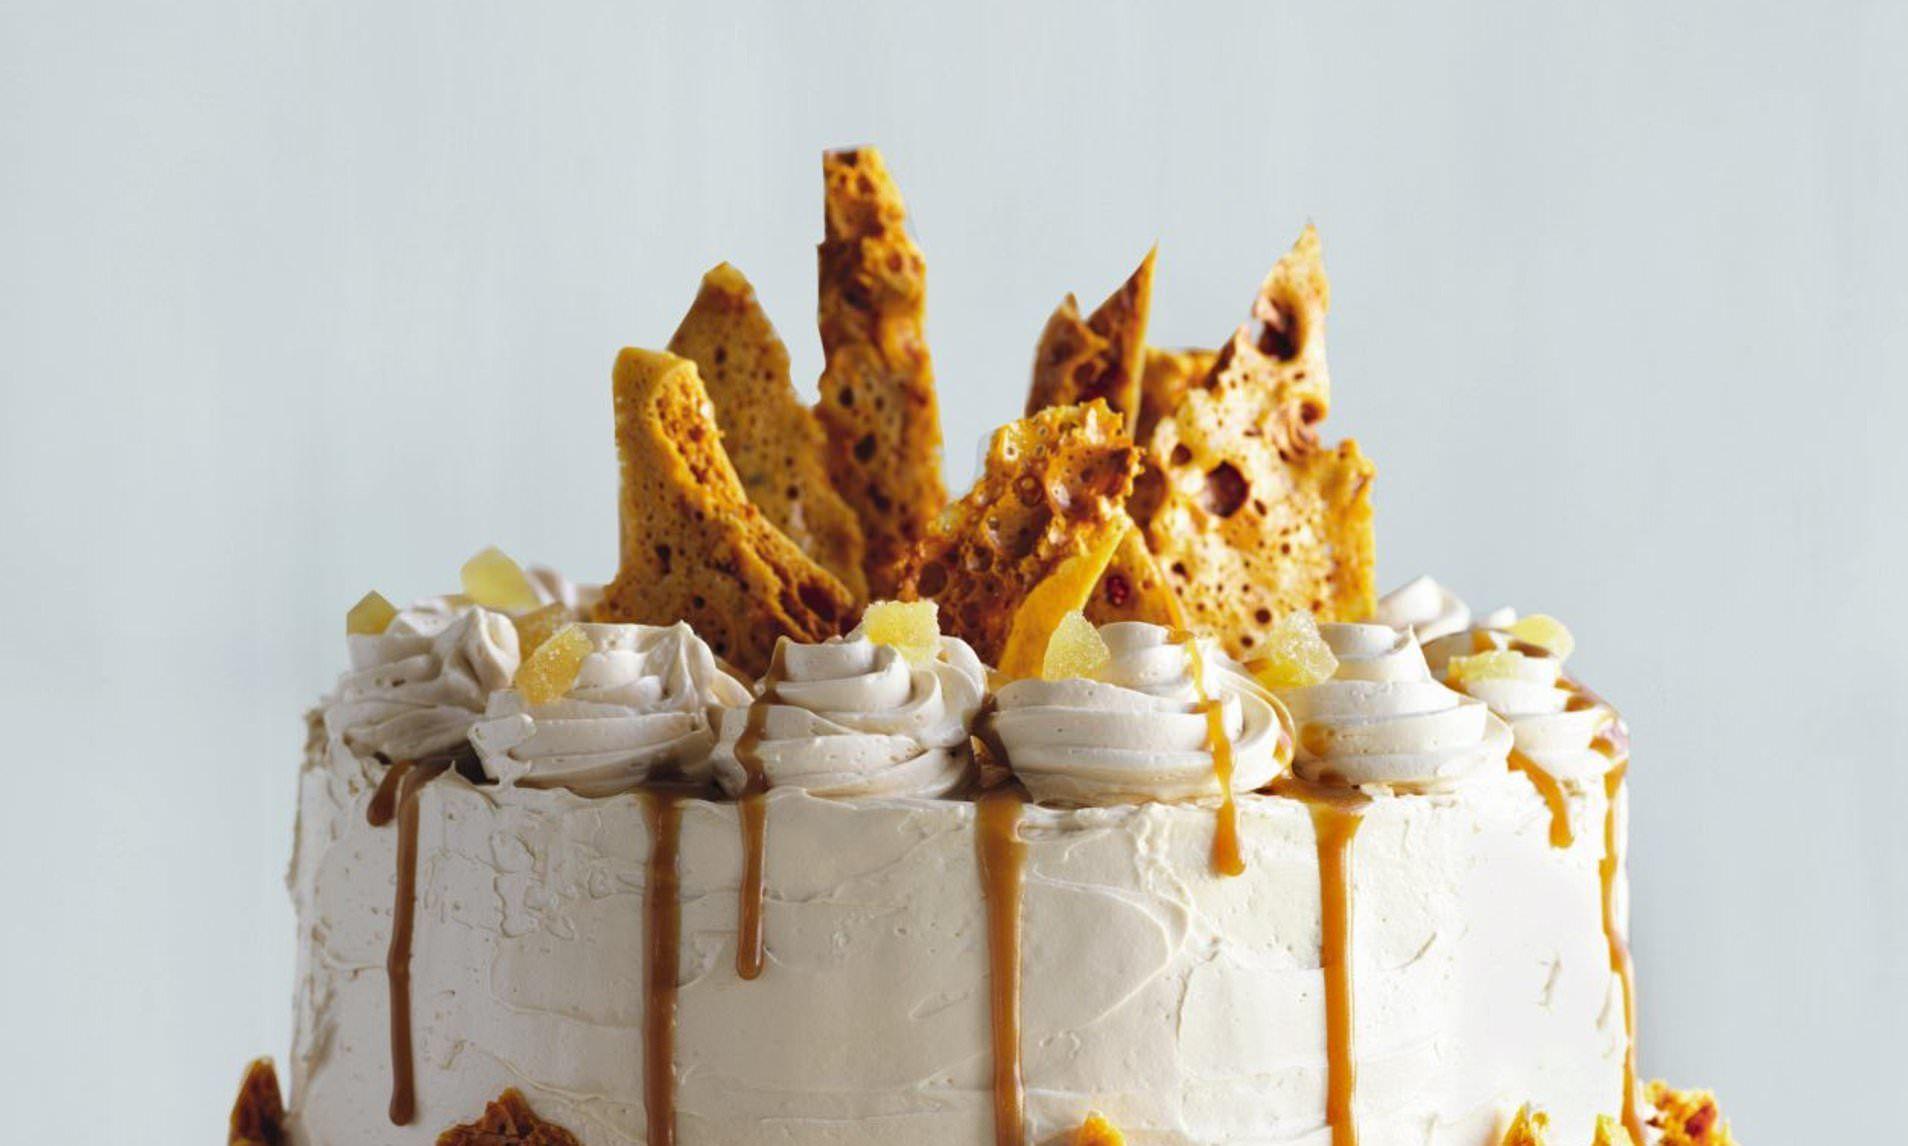 43++ Great british bake off wedding cakes 2013 ideas